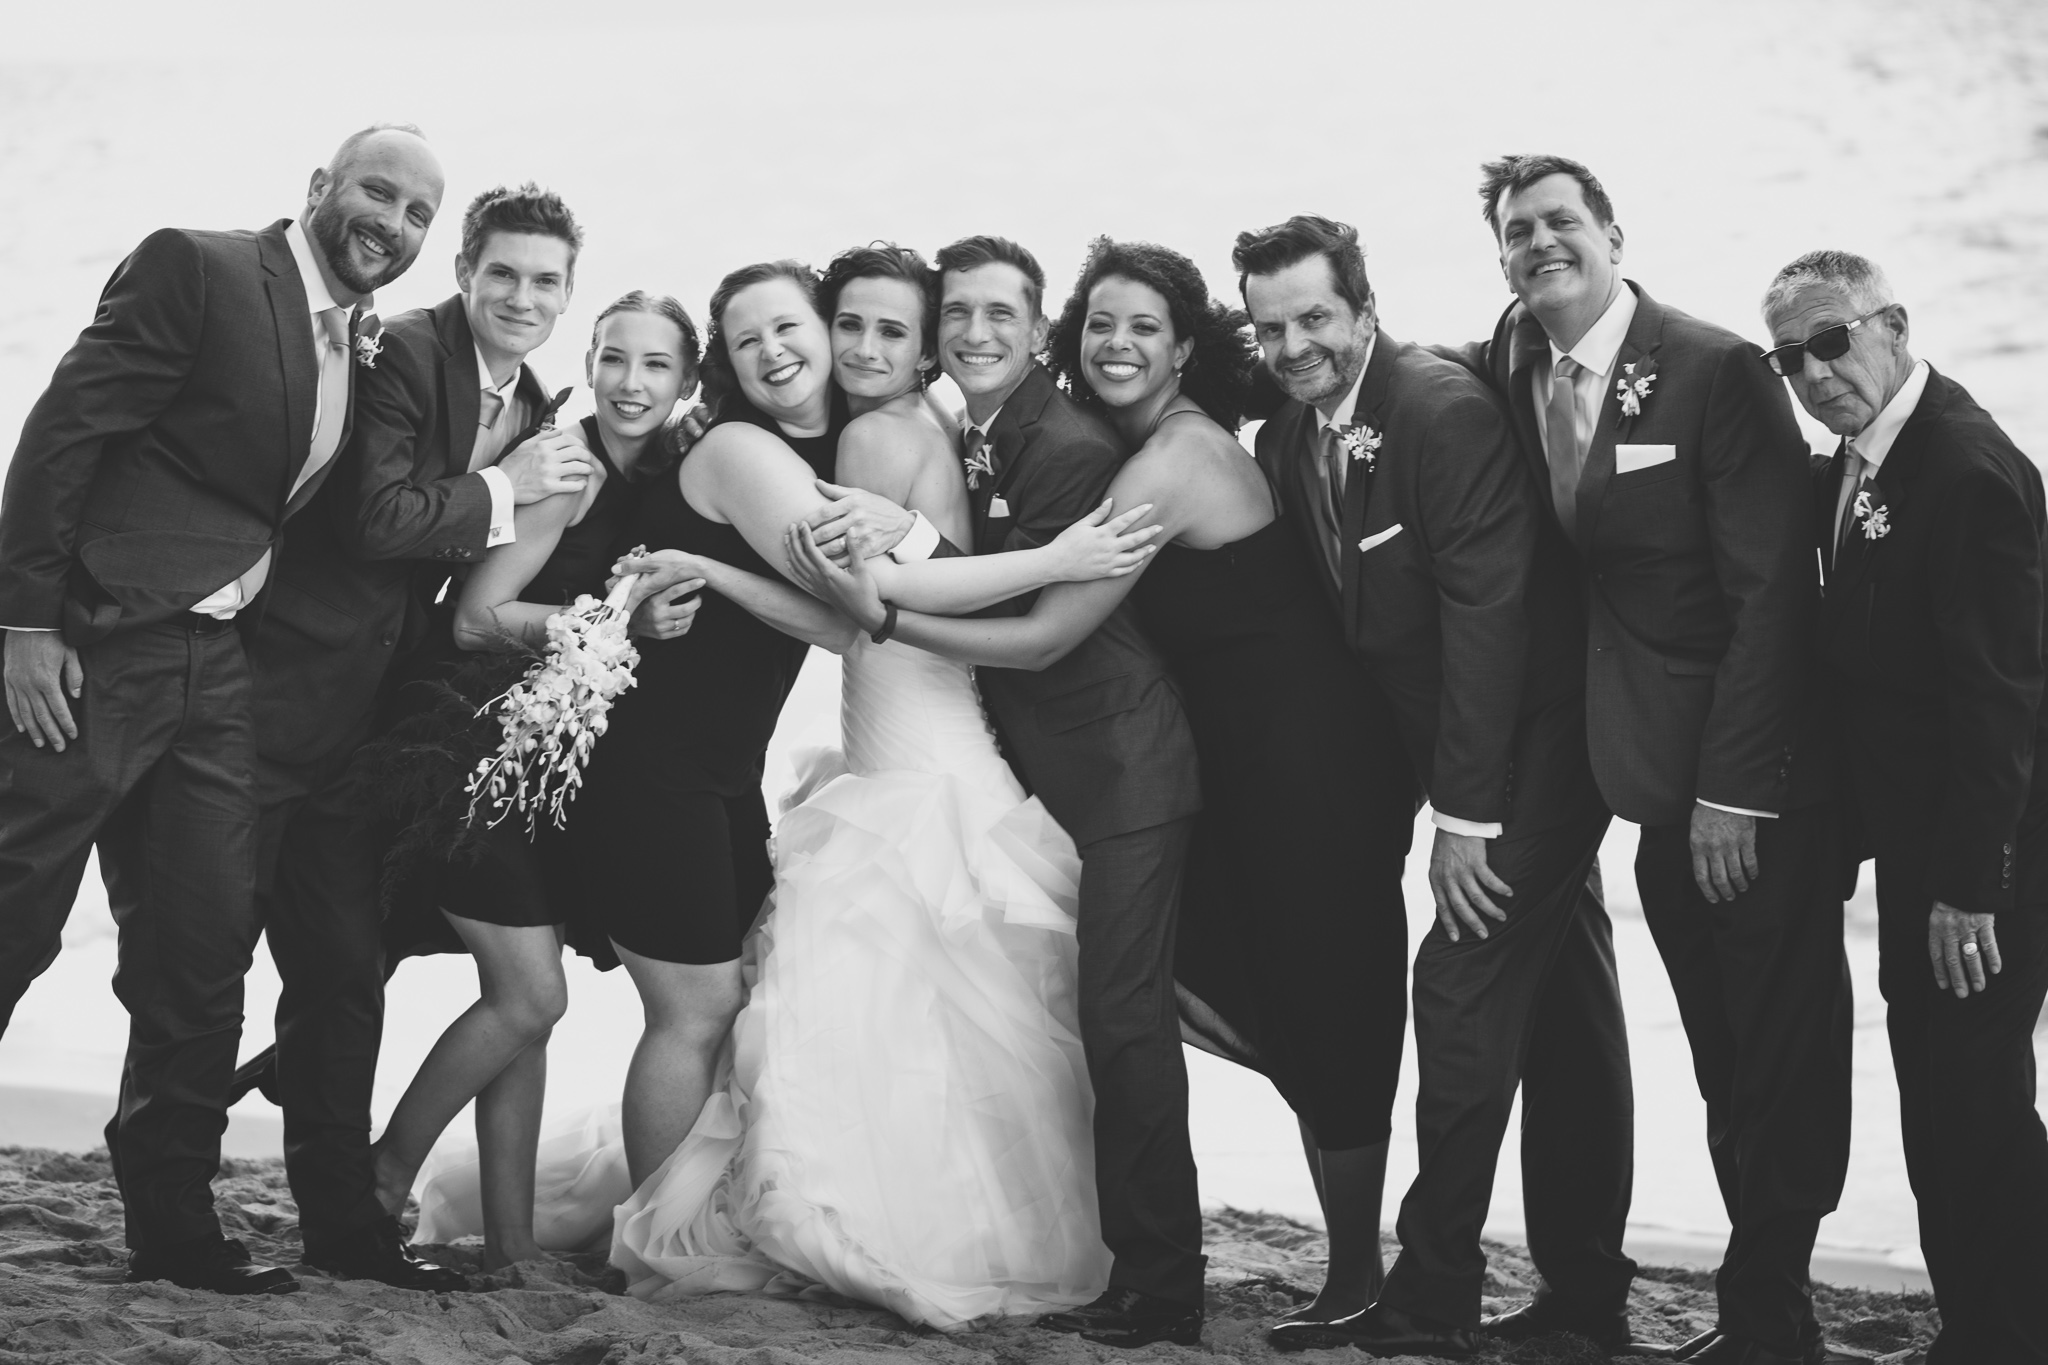 087-best-detroit-michigan-outdoor-destination-wedding-photographer.jpg